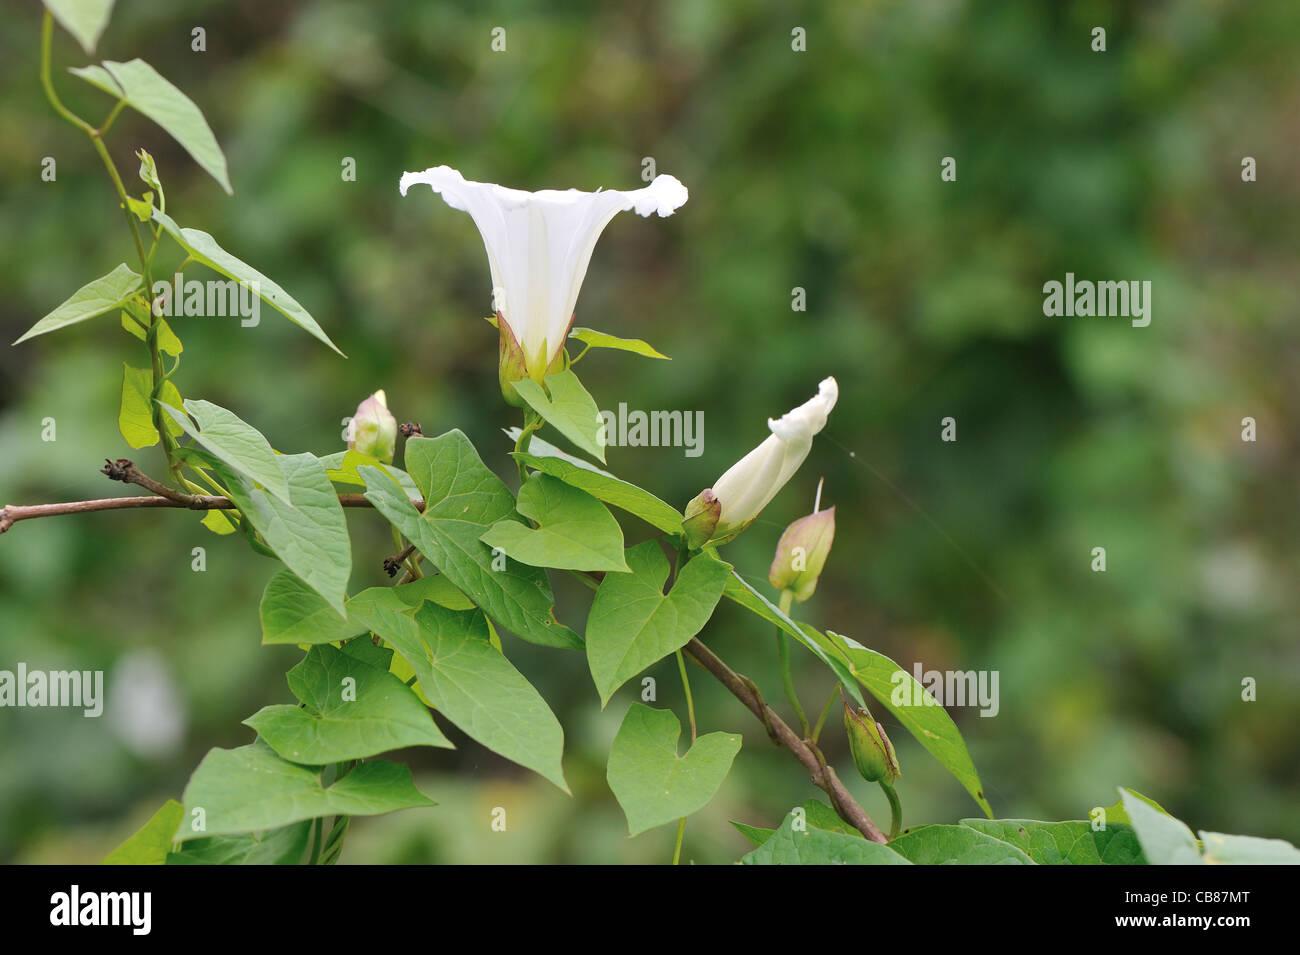 Hedge bindweed - Larger bindweed (Calystegia sepium - Convolvulus sepium) twining around another plant - Stock Image